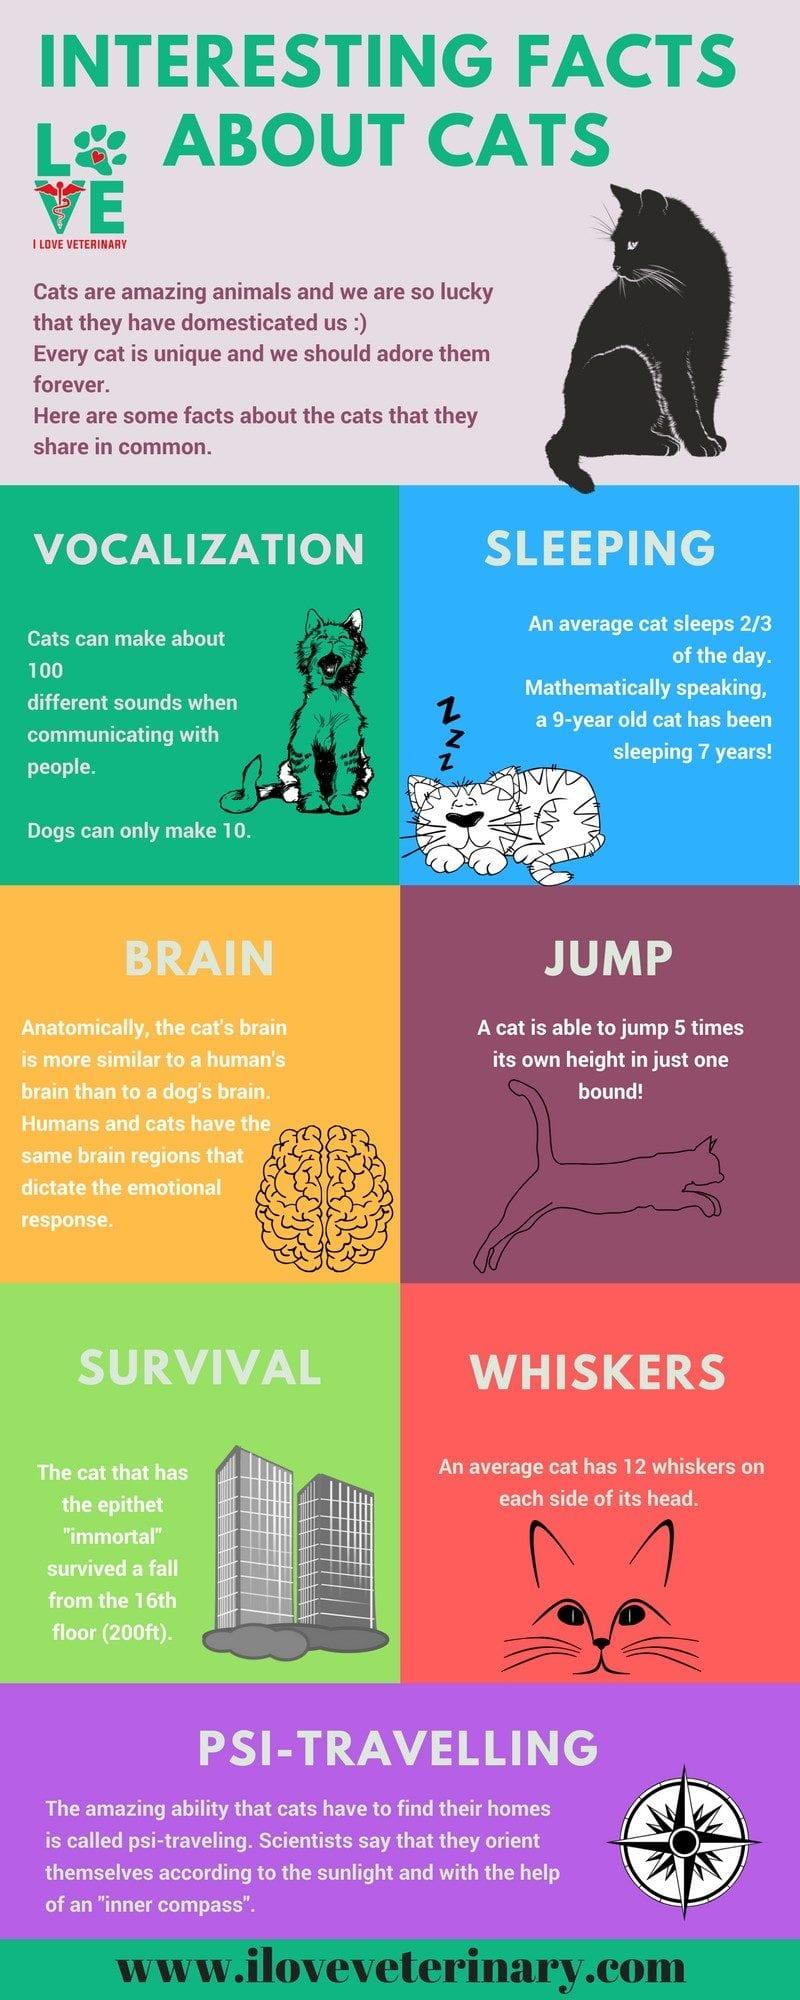 interesting factsabout cats1 1 I Love Veterinary - Blog for Veterinarians, Vet Techs, Students